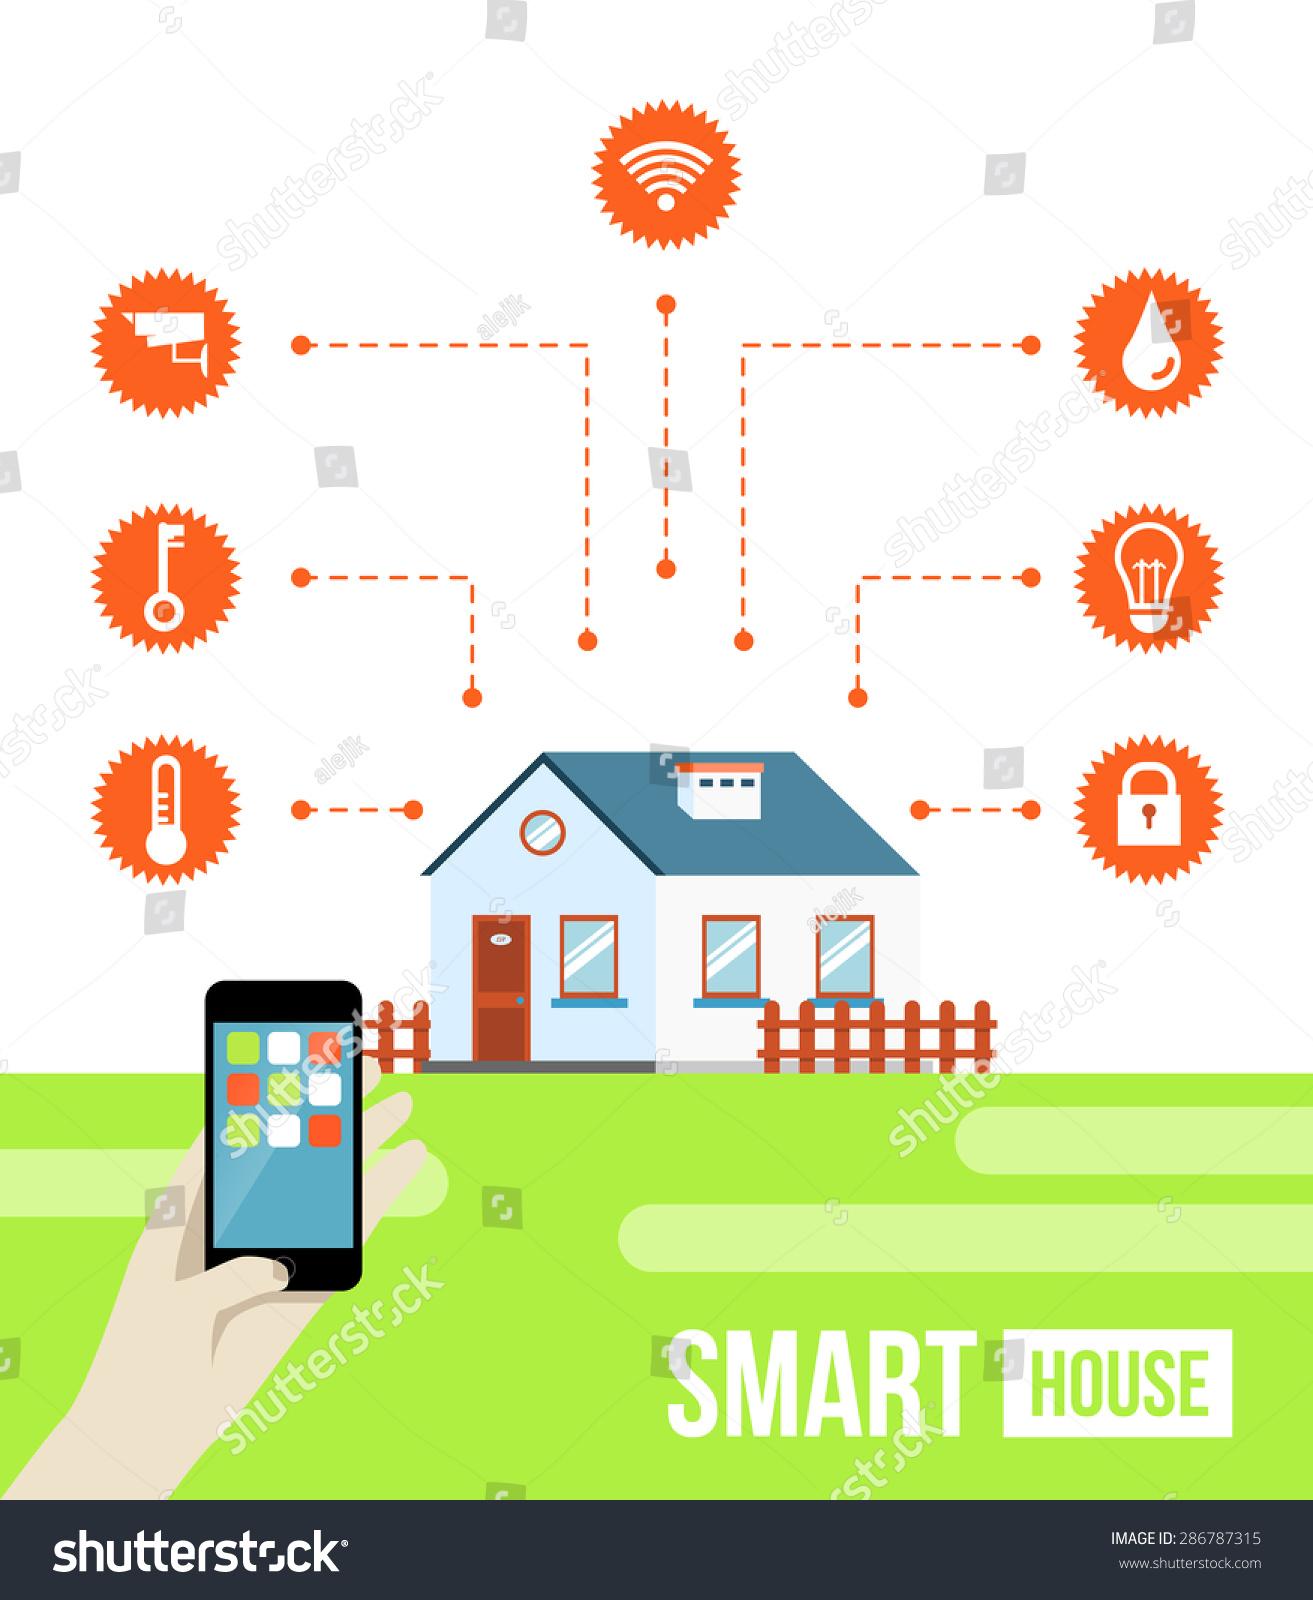 Smart Home Technologies: Vector Concept Smart House Smart Home Stock Vector